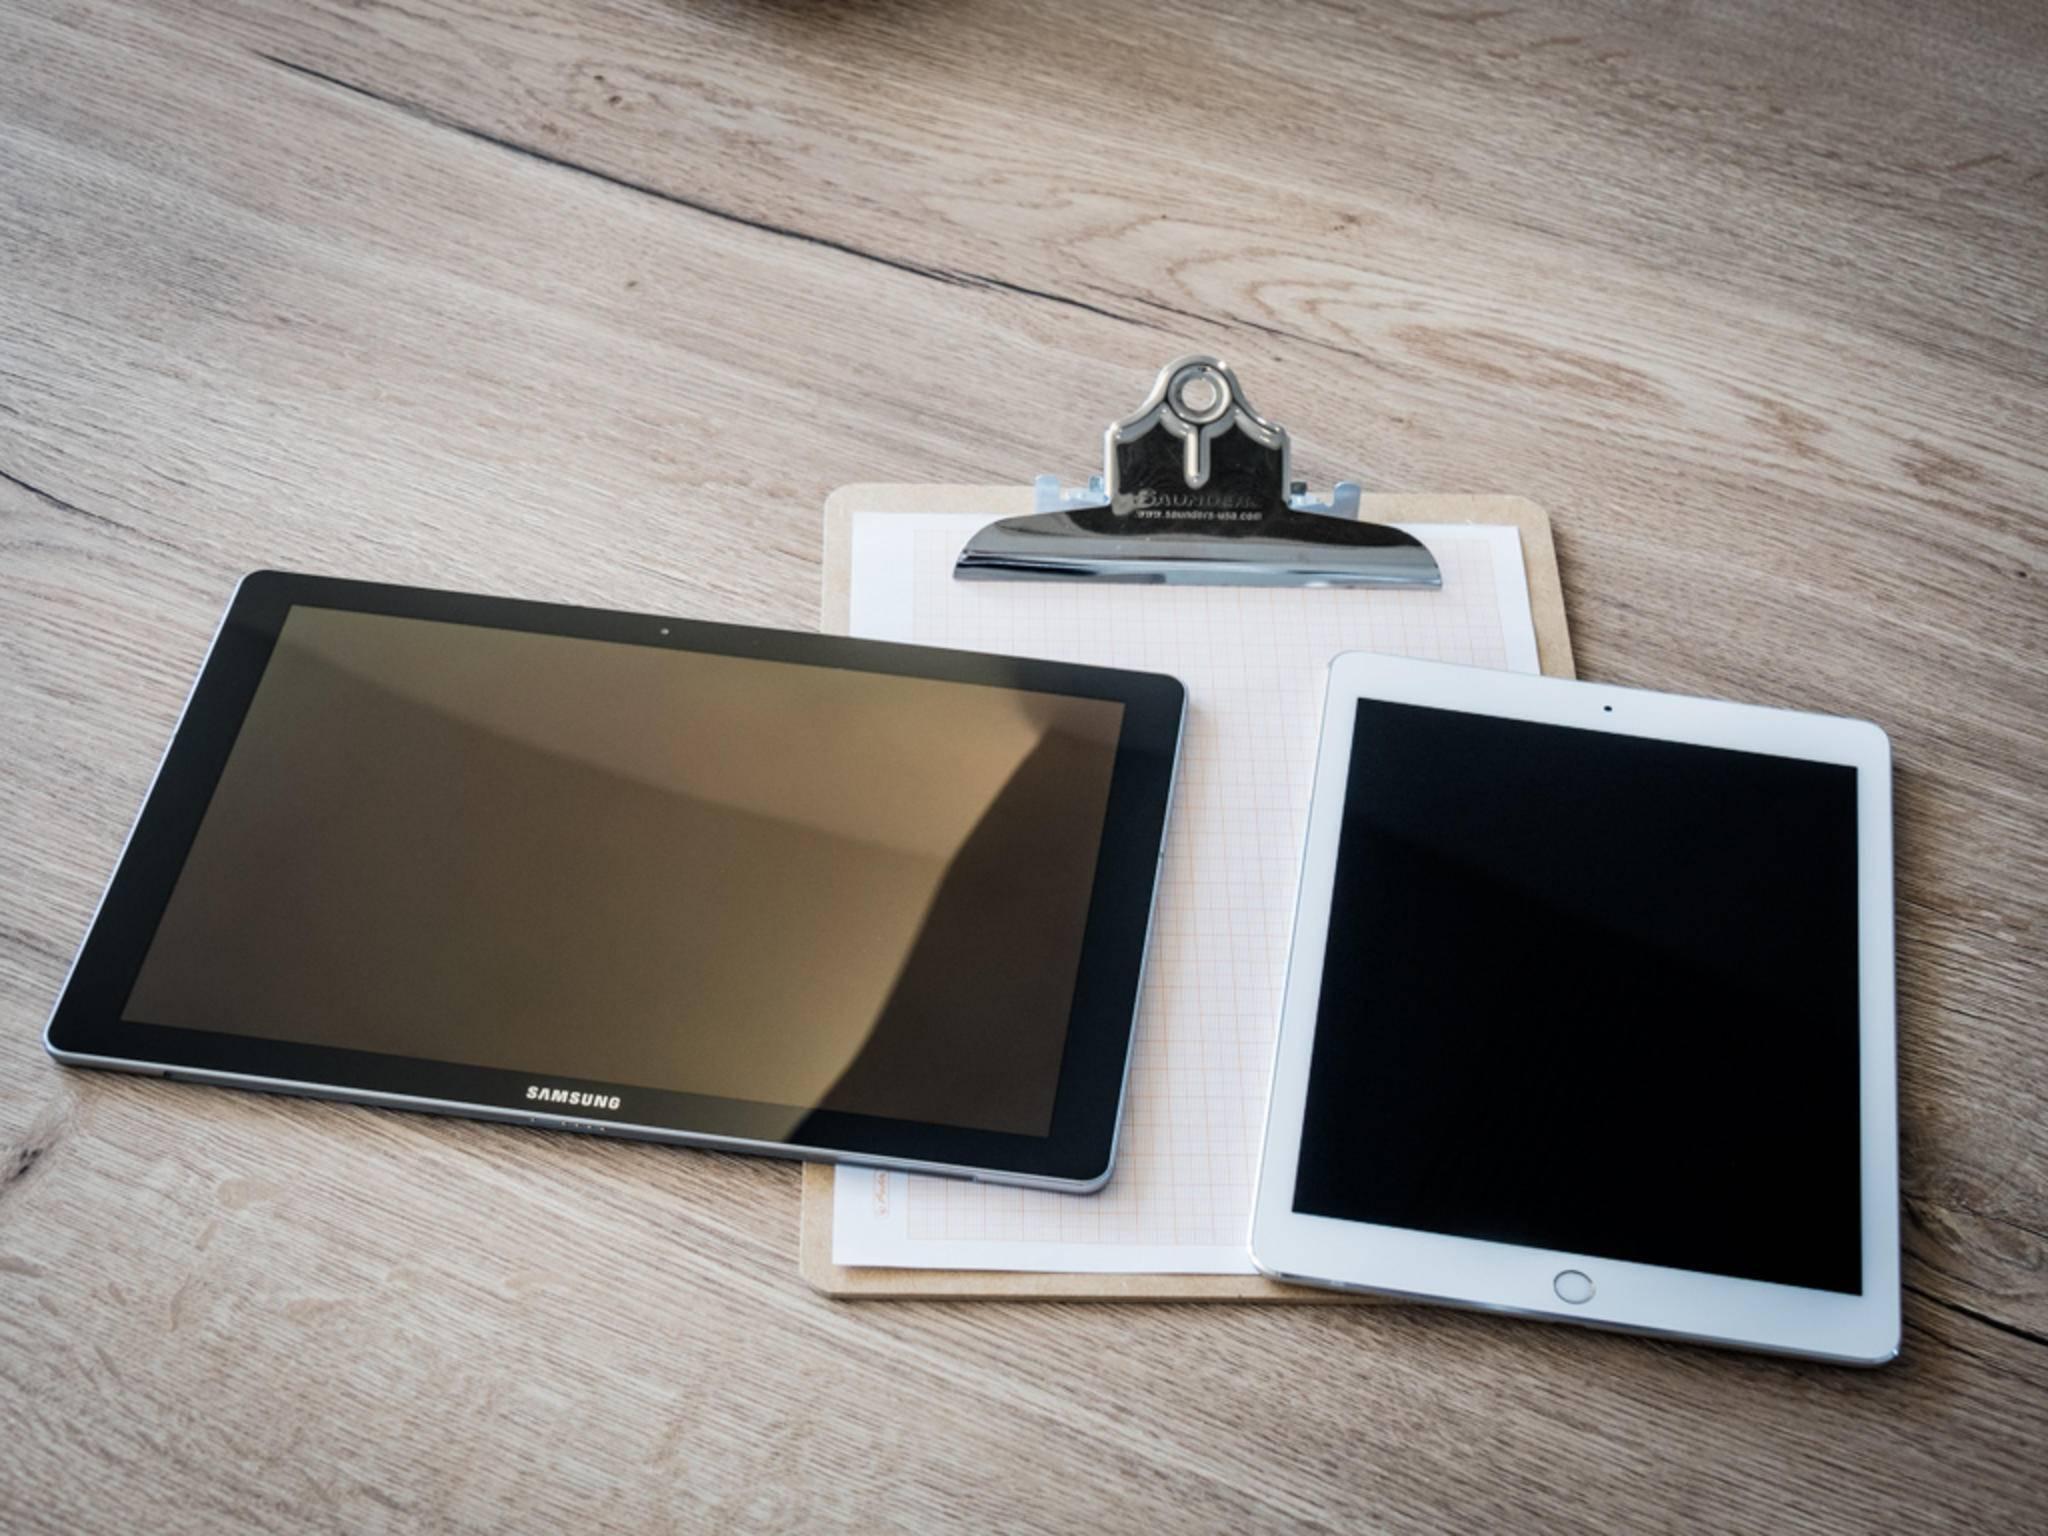 Das Design ähnelt dem des iPad Pro (rechts).